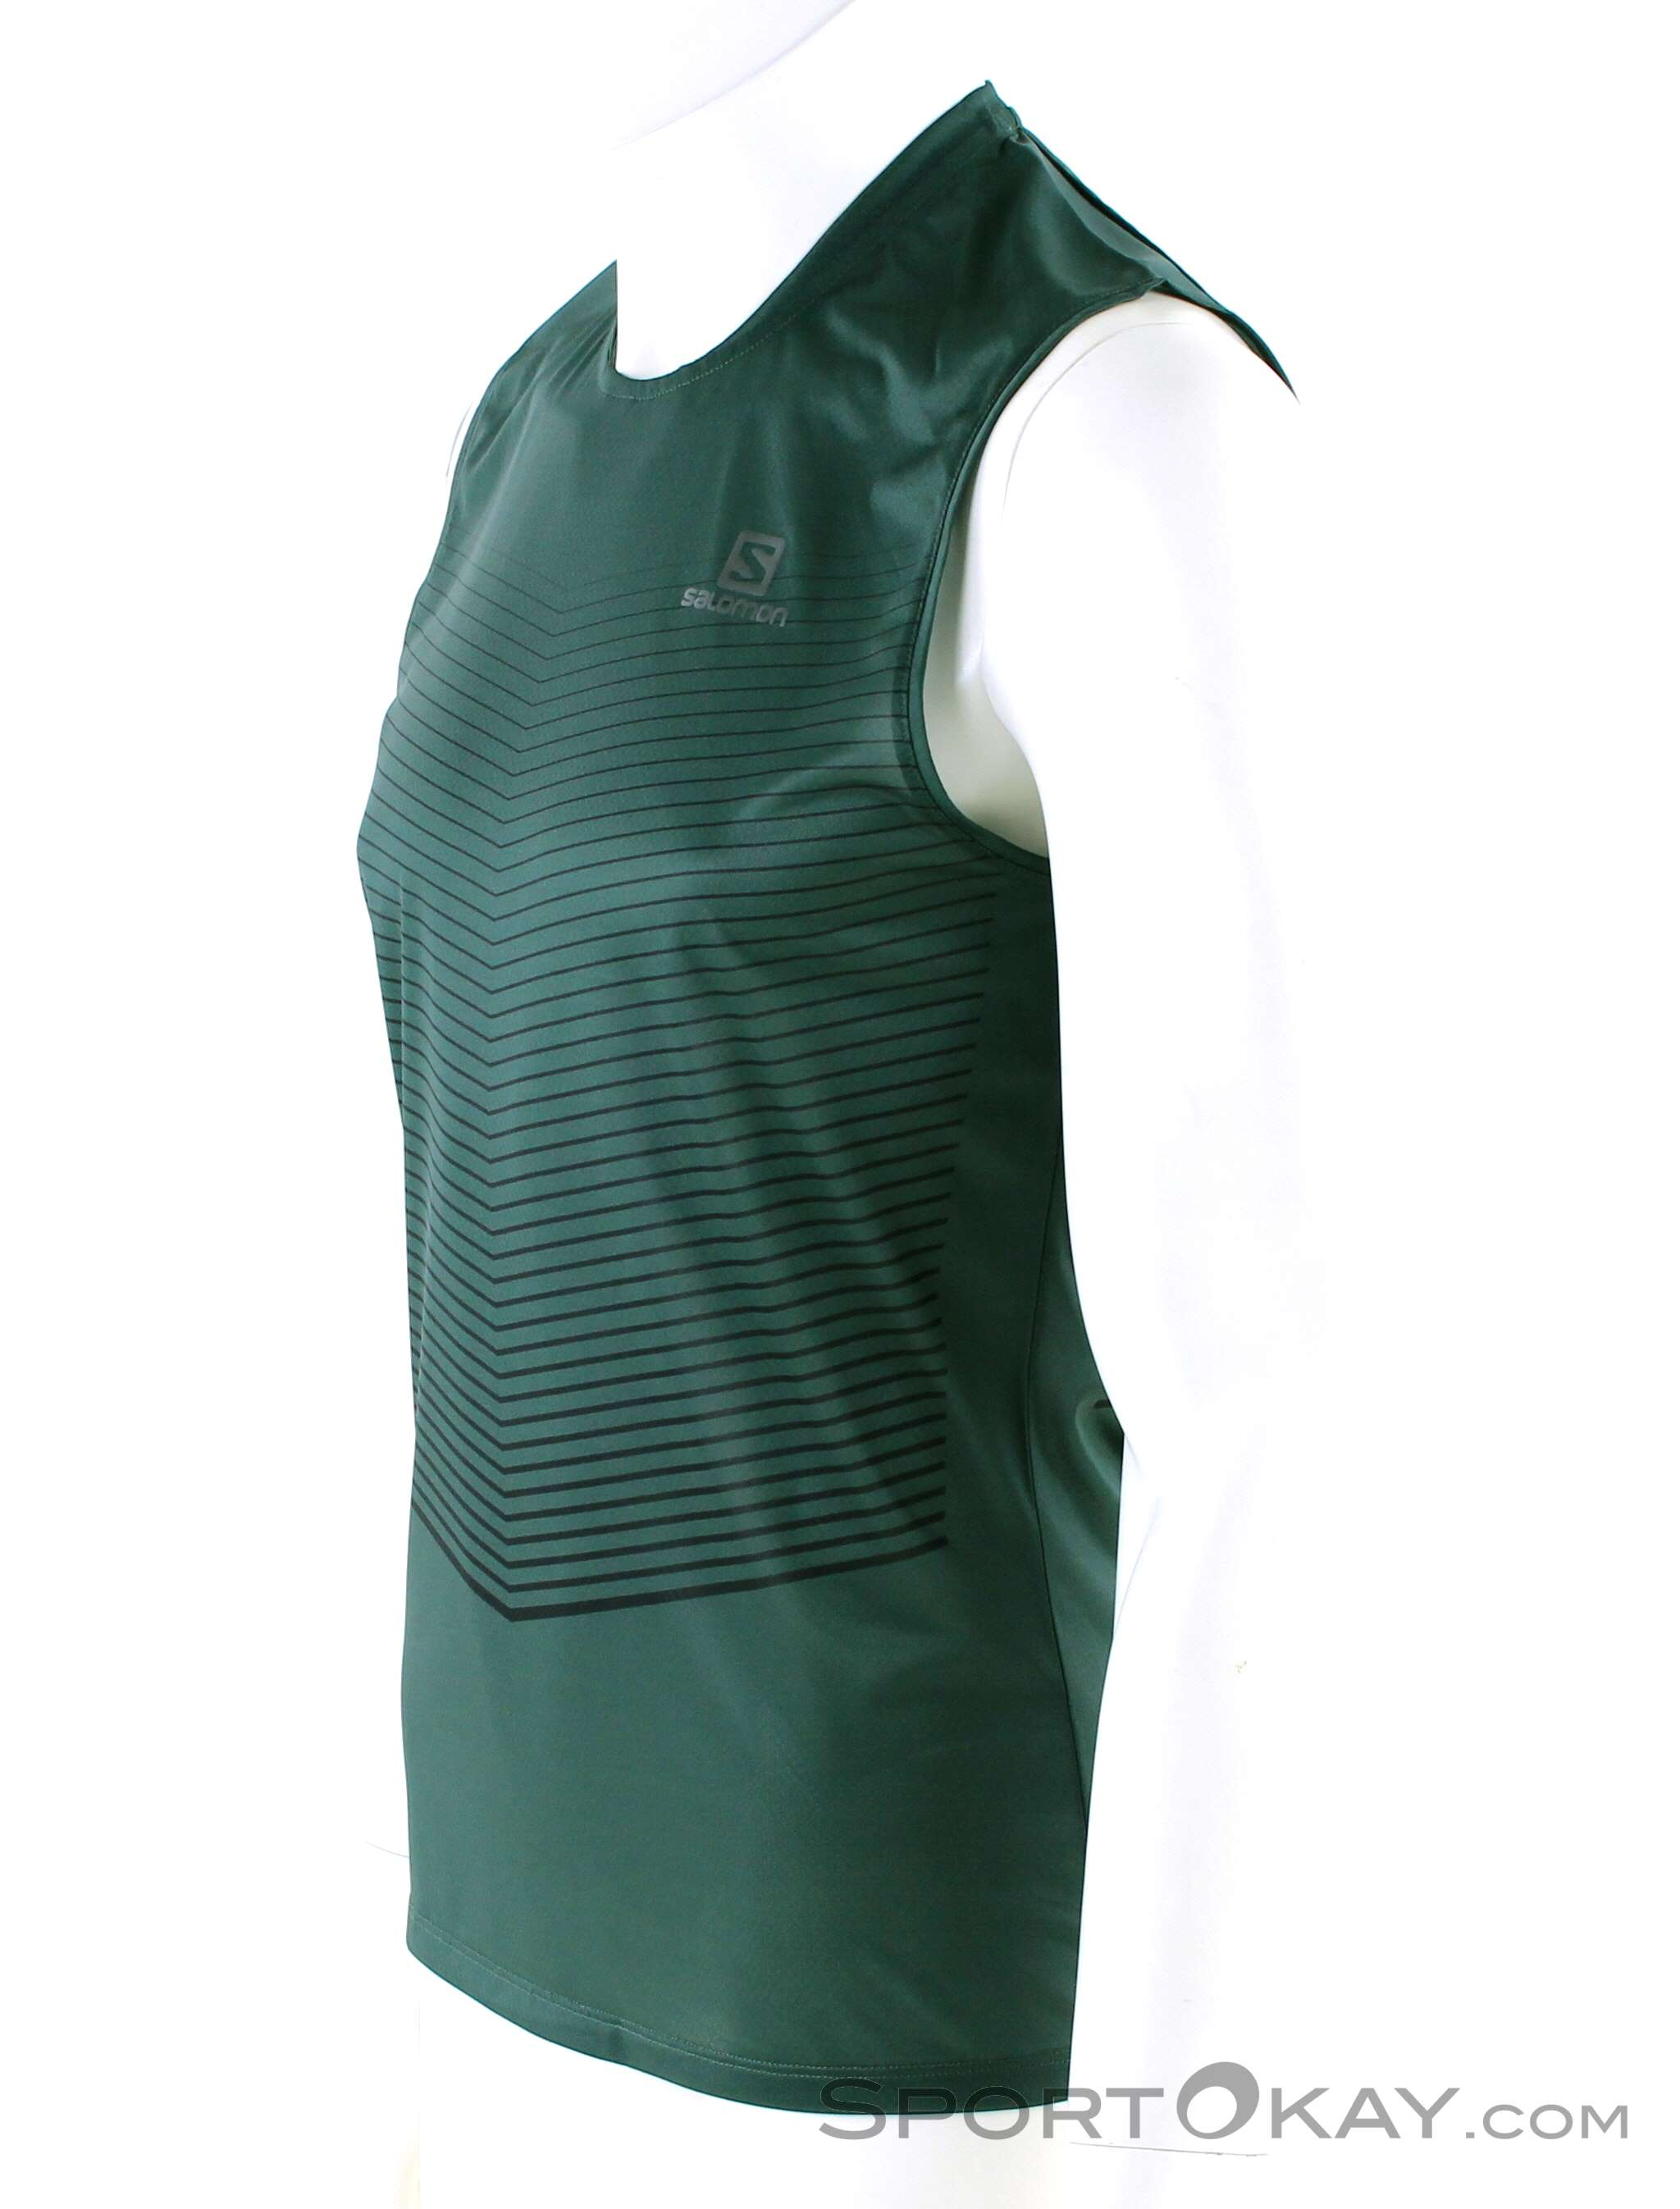 Salomon Sense Tank Herren Tanktop Shirts